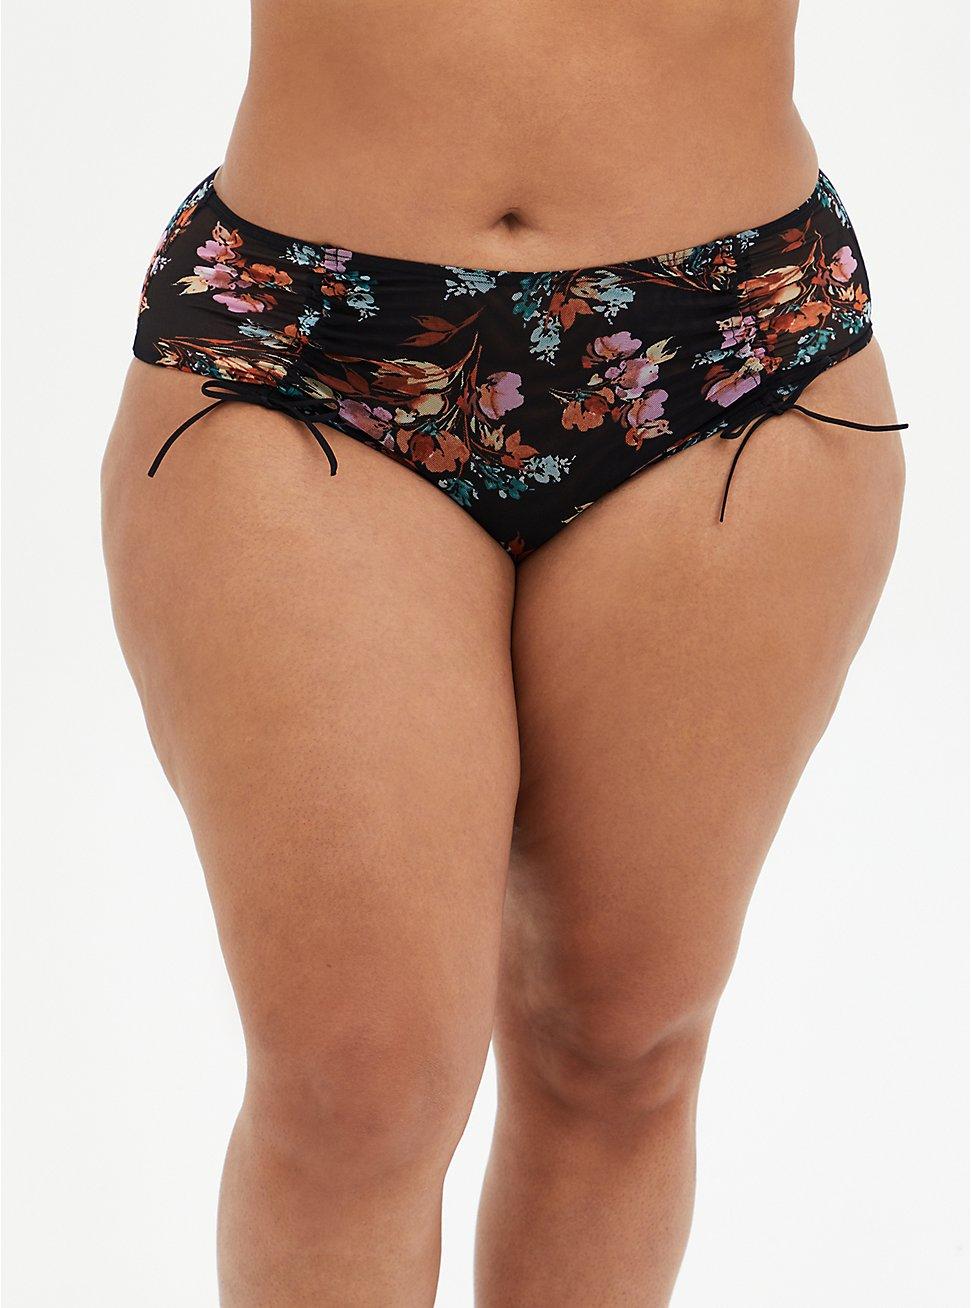 Black Floral Mesh Drawstring Cheeky Panty, SPRING FLORAL, hi-res